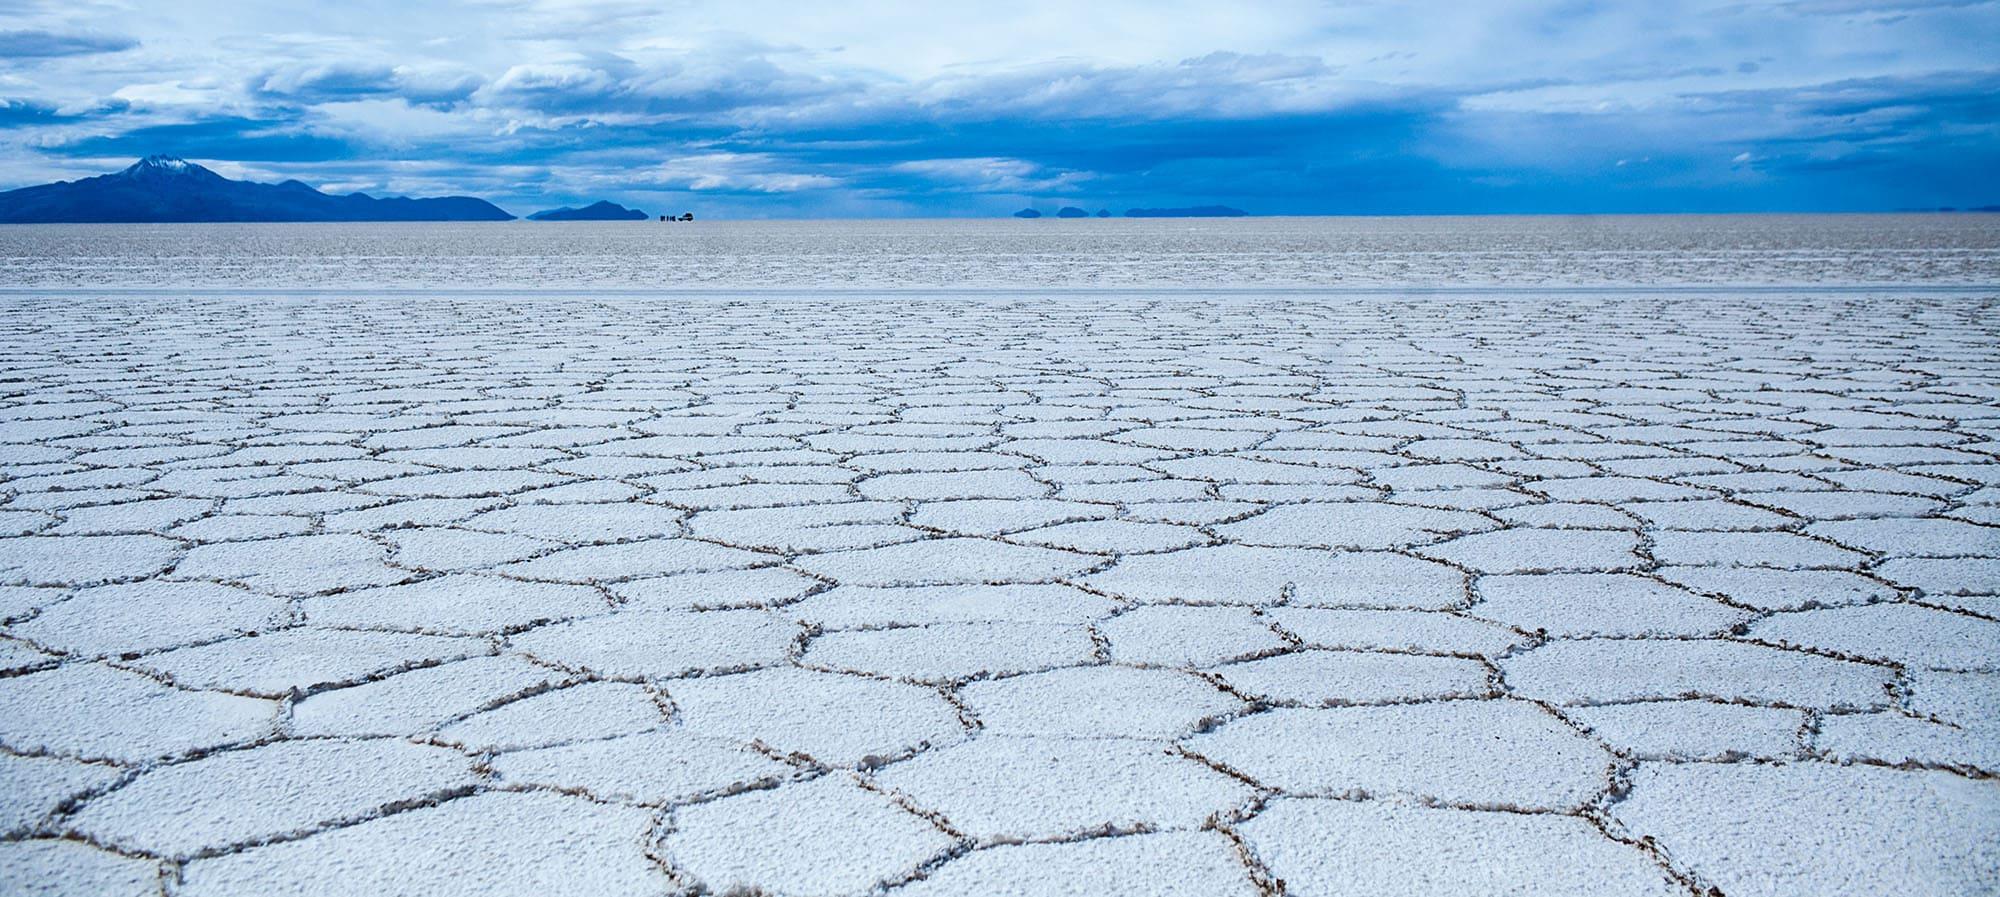 Bolivia's Salar de Uyuni 3 Day Salt Flat Tour • Choosing Figs